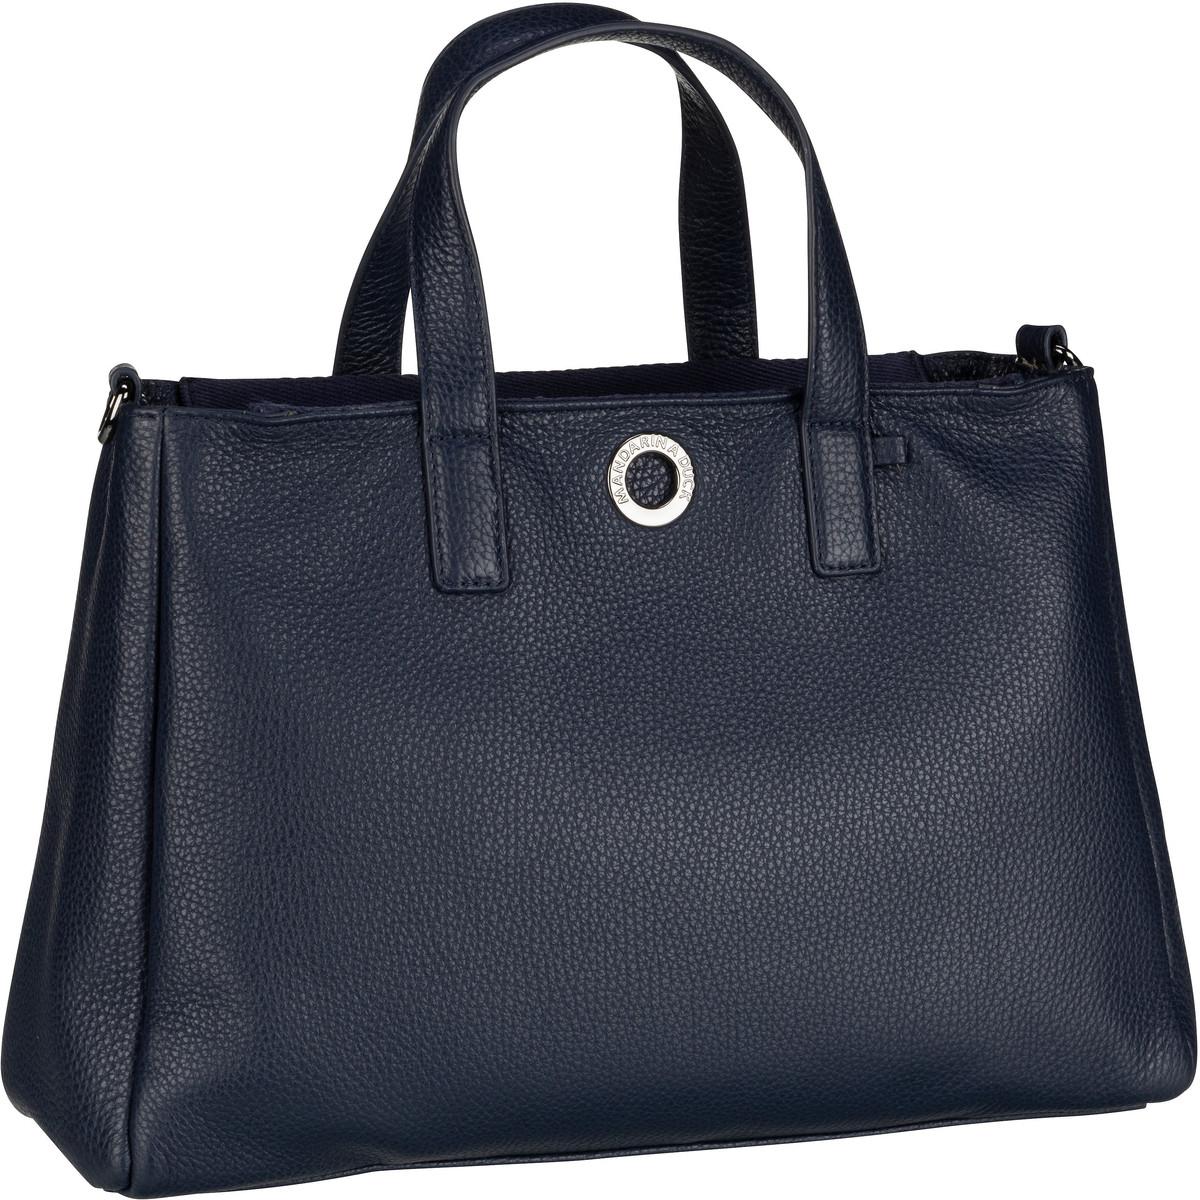 Handtasche Mellow Leather Tote Bag FZT26 Dress Blue